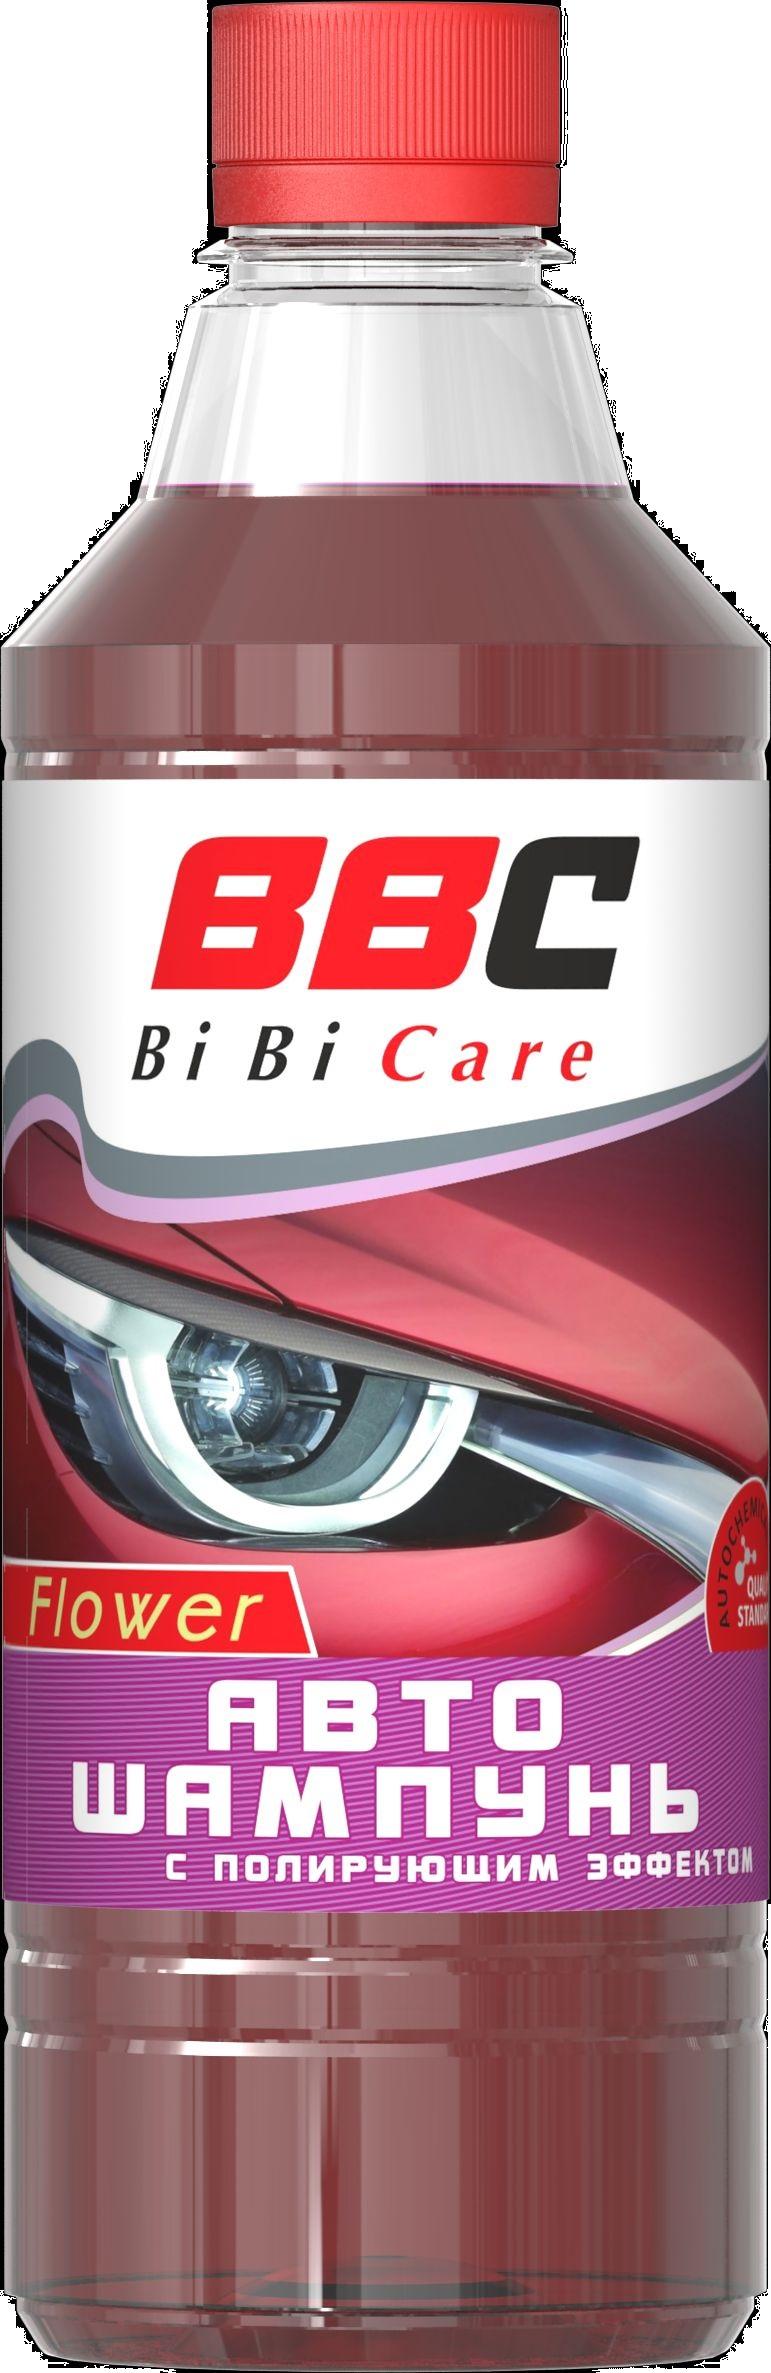 Автошампунь Lavr BiBiCare 550 мл Ln4114